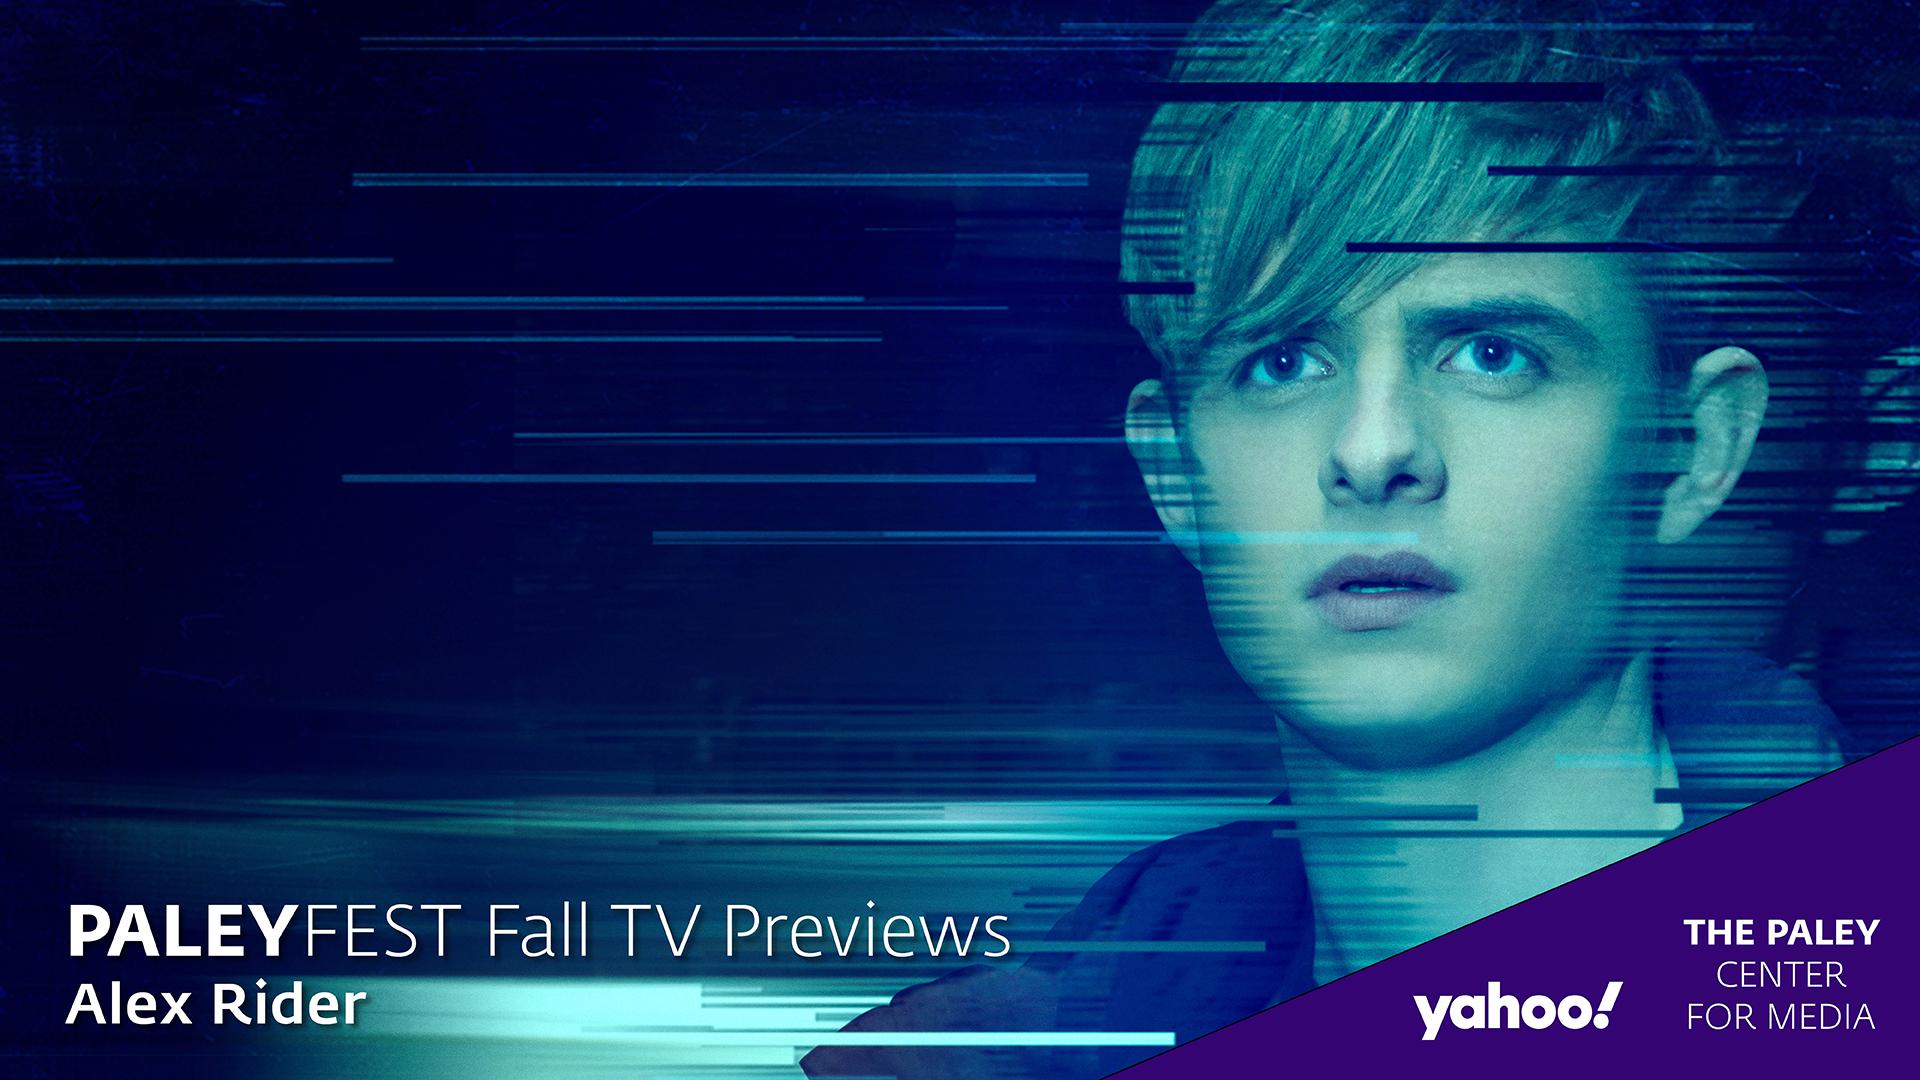 Alex Rider at PaleyFest Fall TV Previews 2020